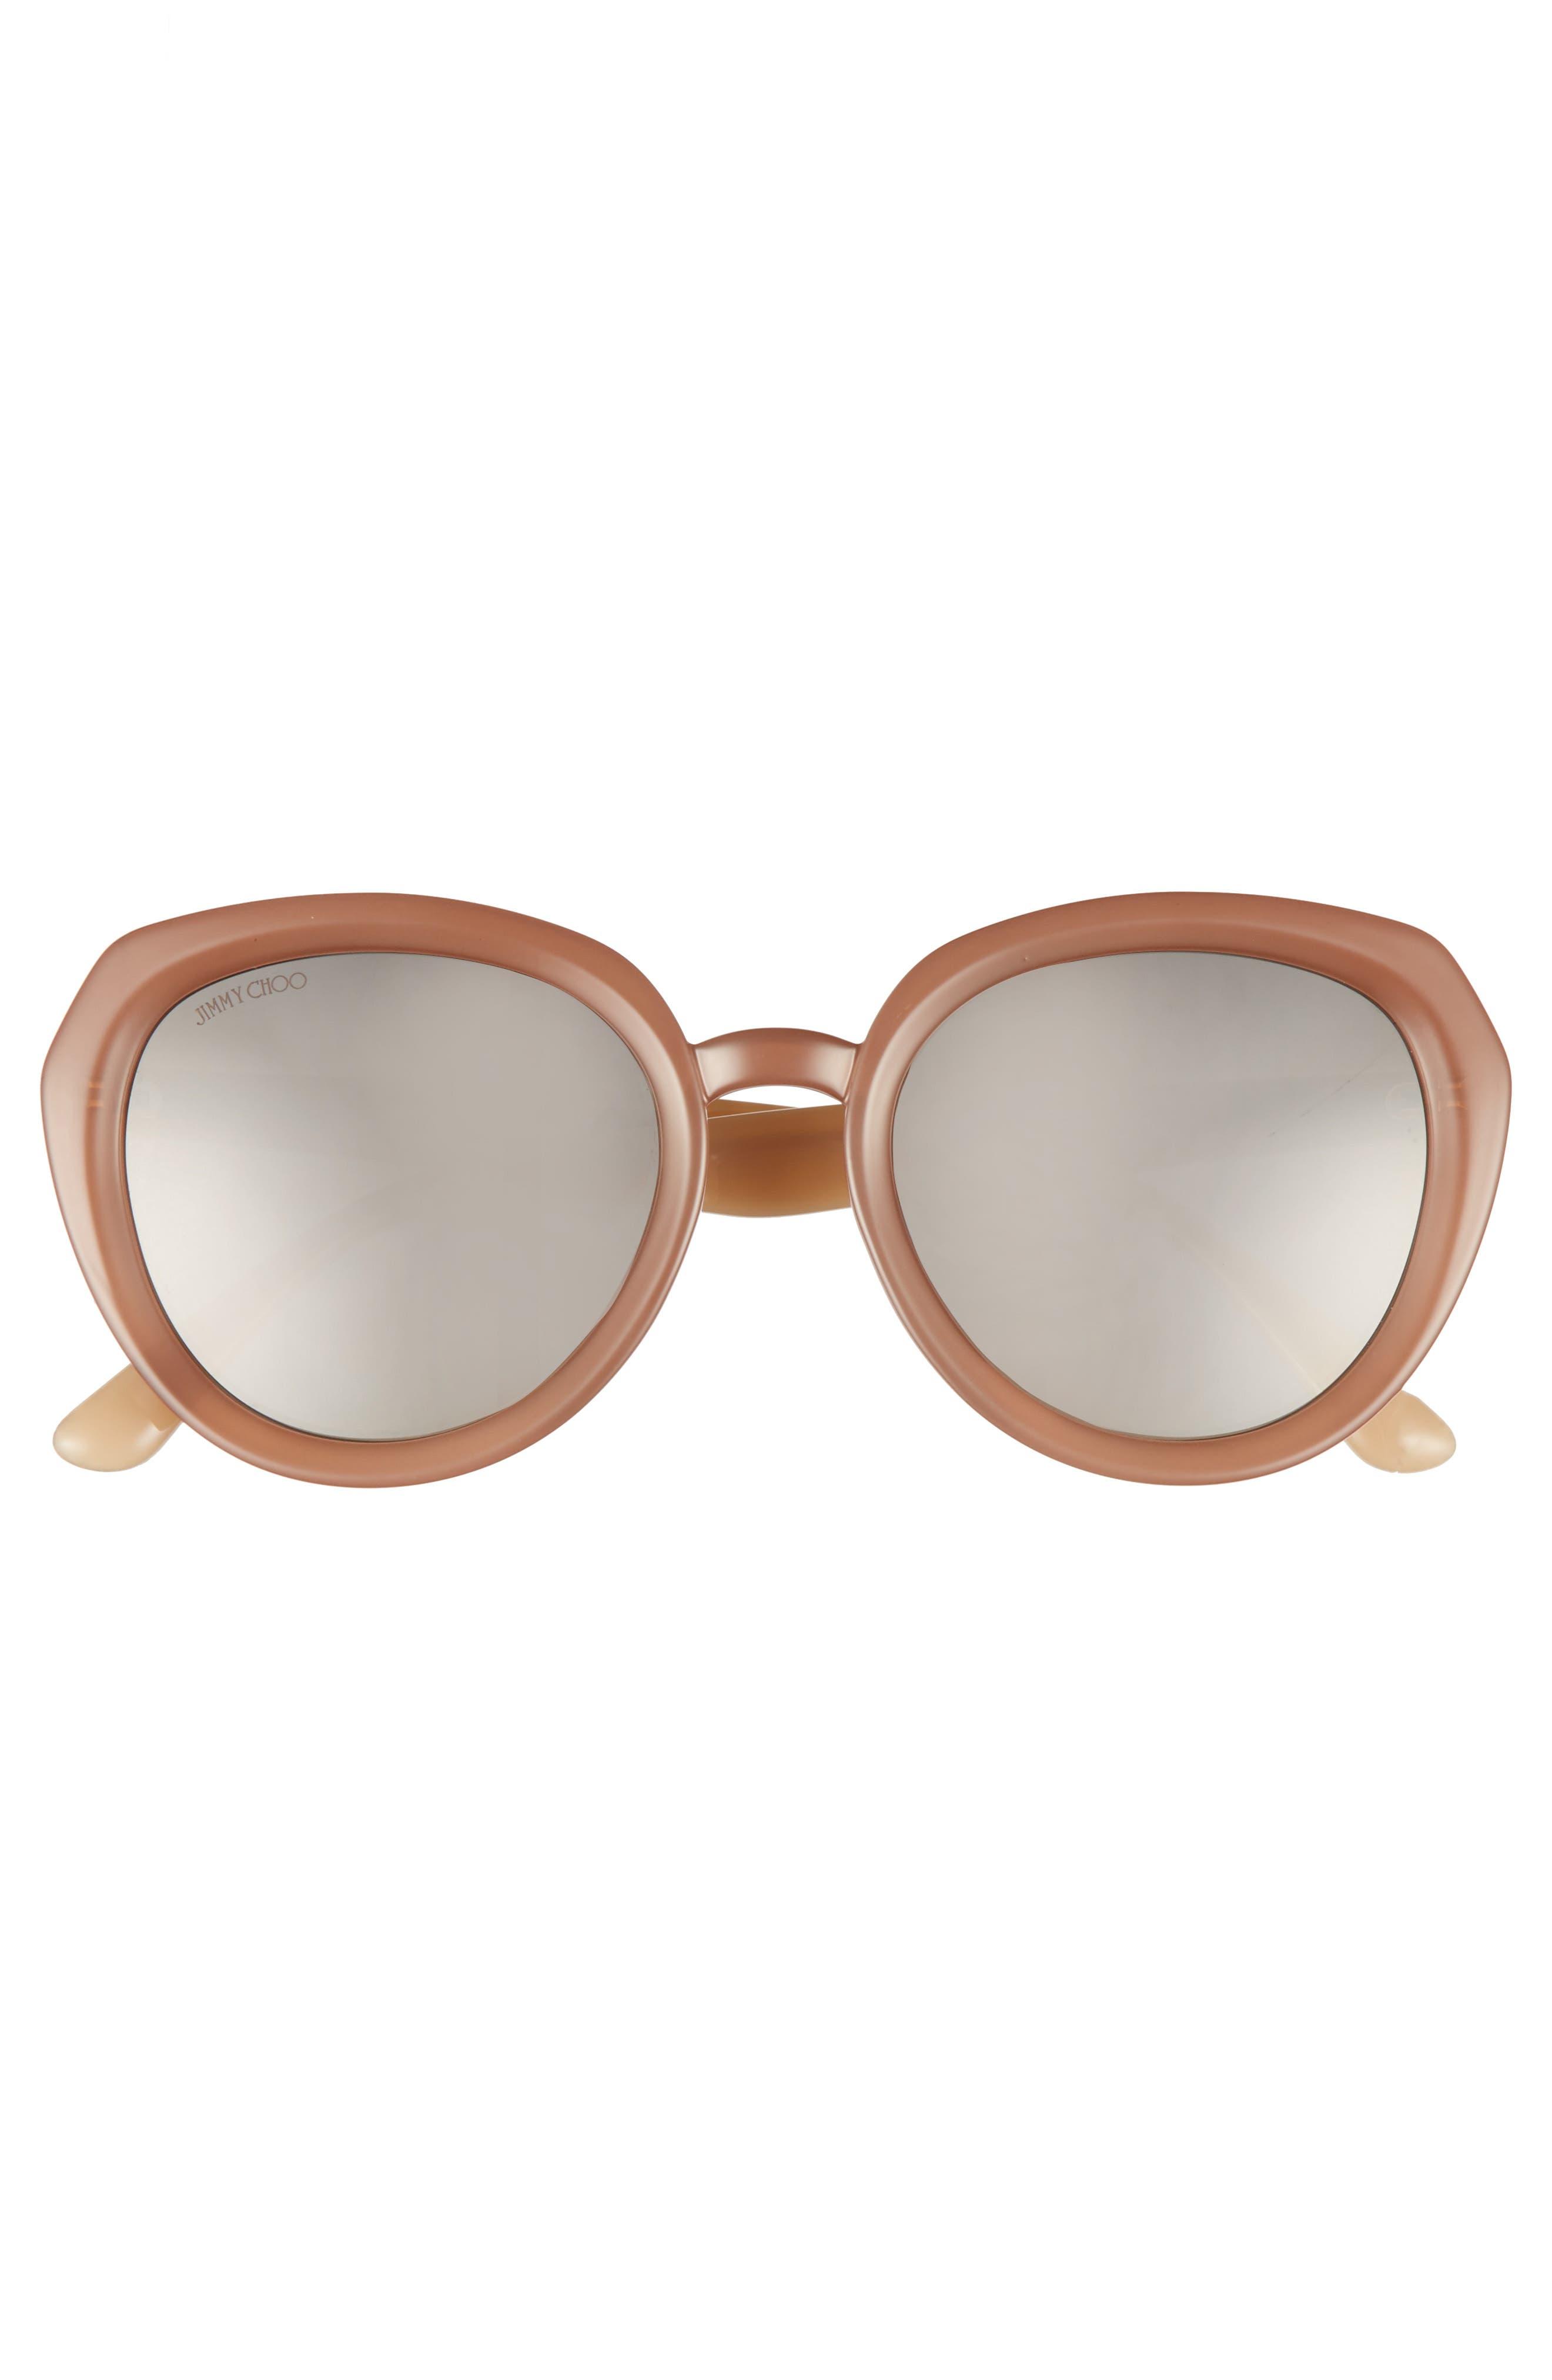 Alternate Image 3  - Jimmy Choo Maces 53mm Oversize Sunglasses